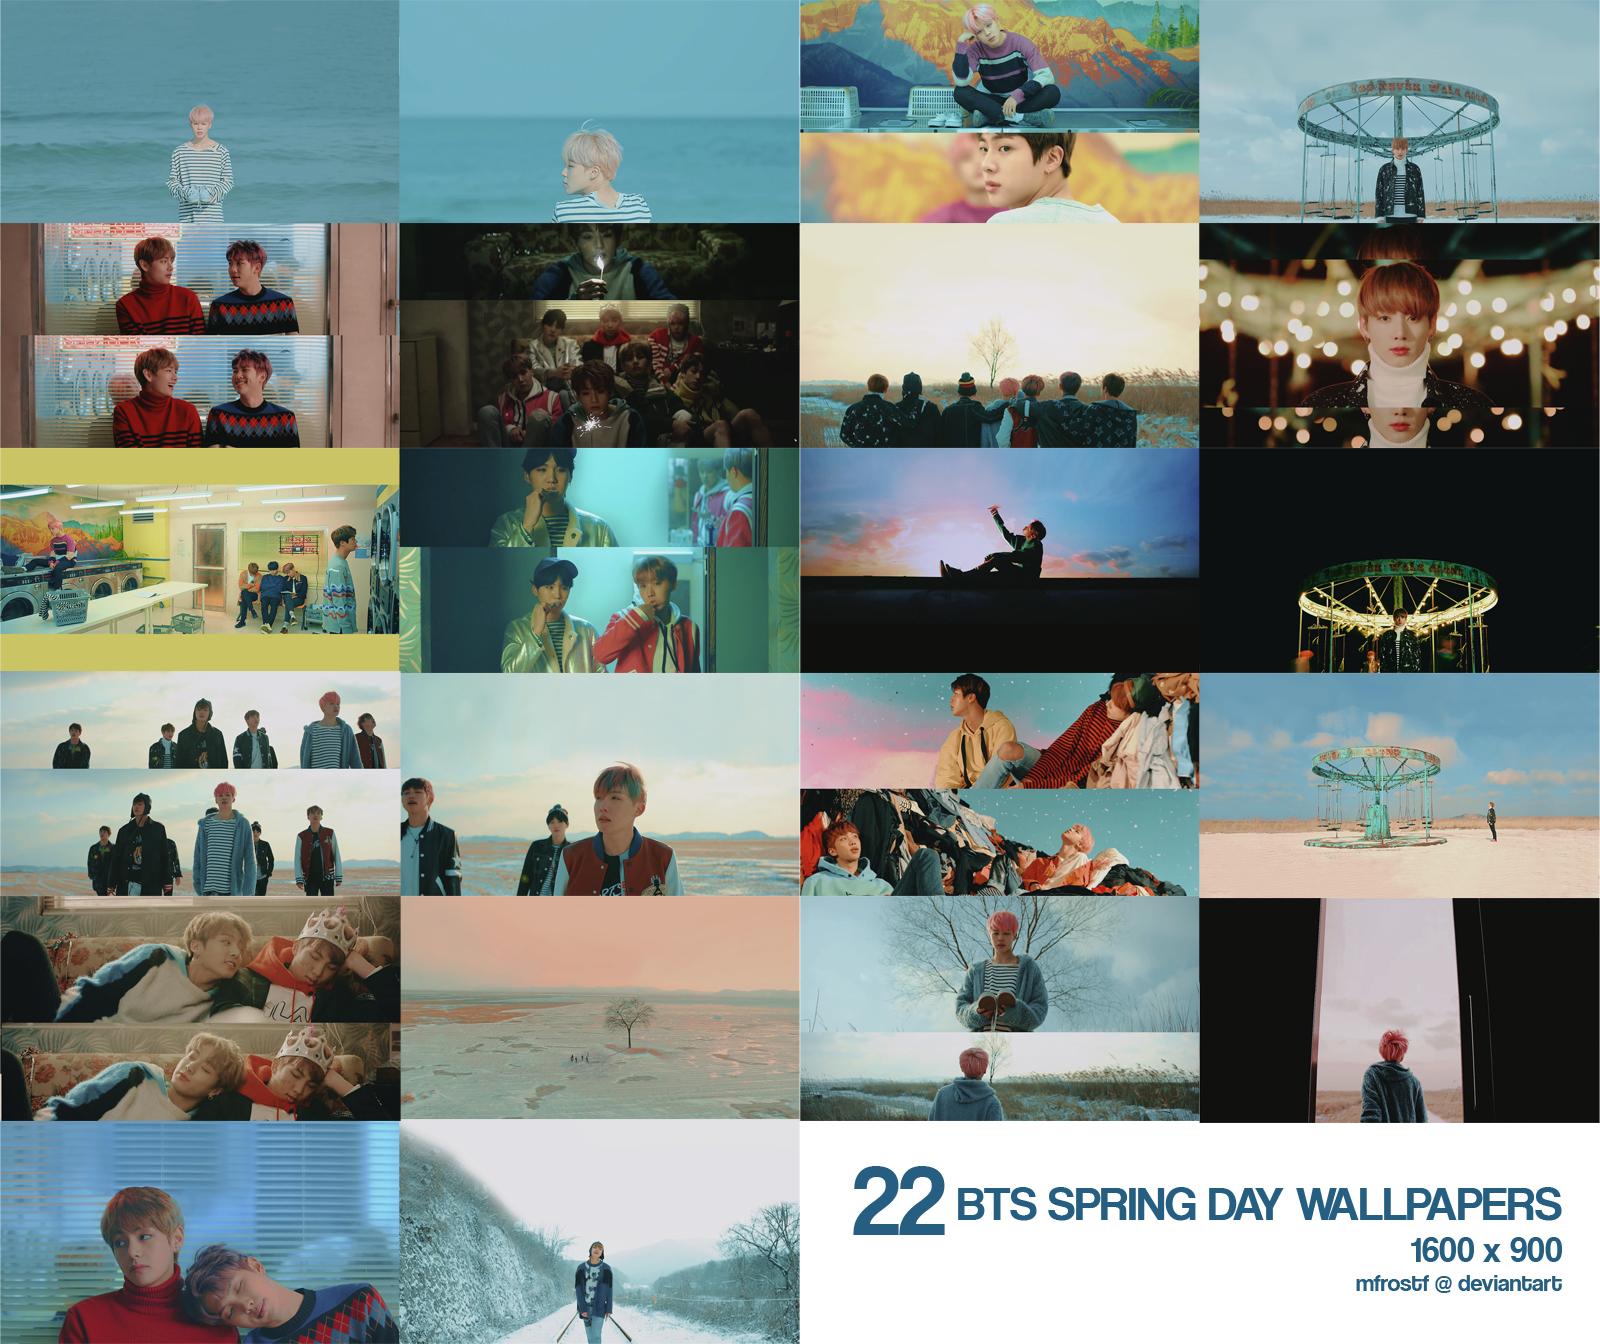 bts desktop wallpaper | Tumblr | taekook9597 | Pinterest | Desktop ...